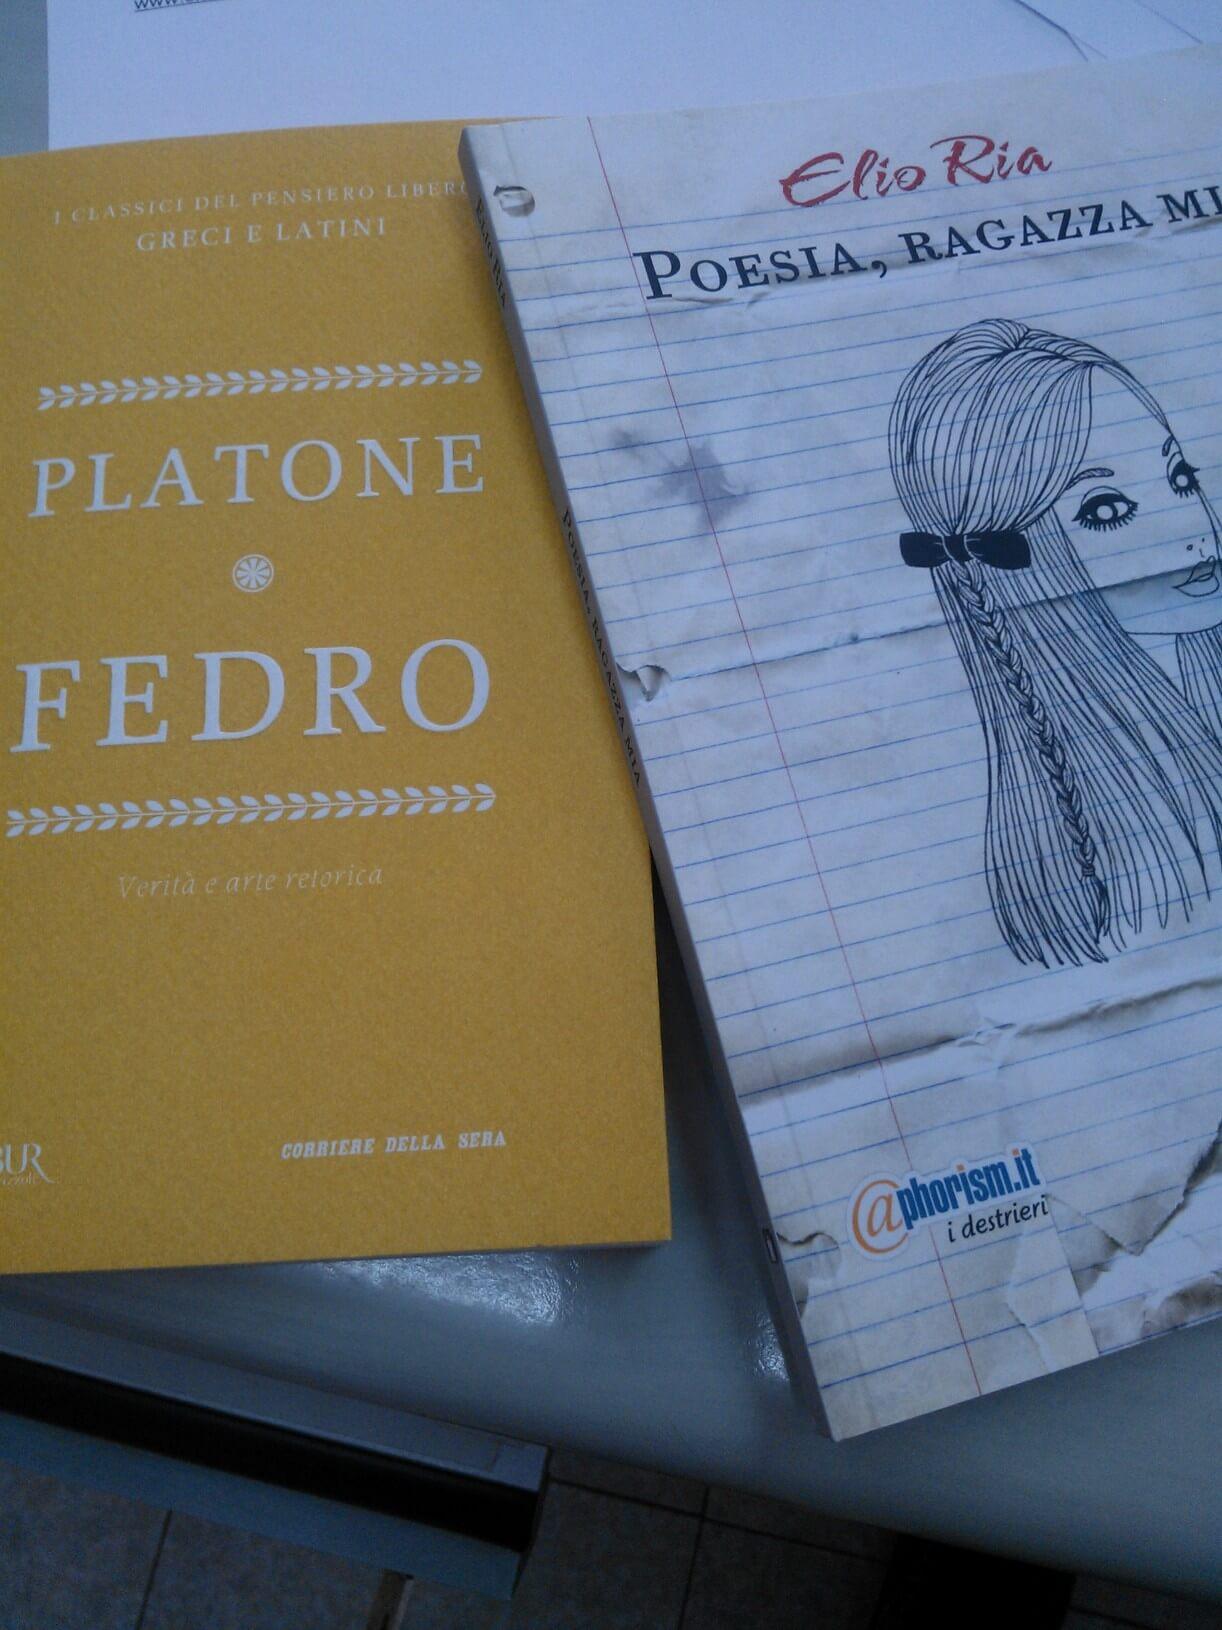 Poesia, ragazza mia - Fedro